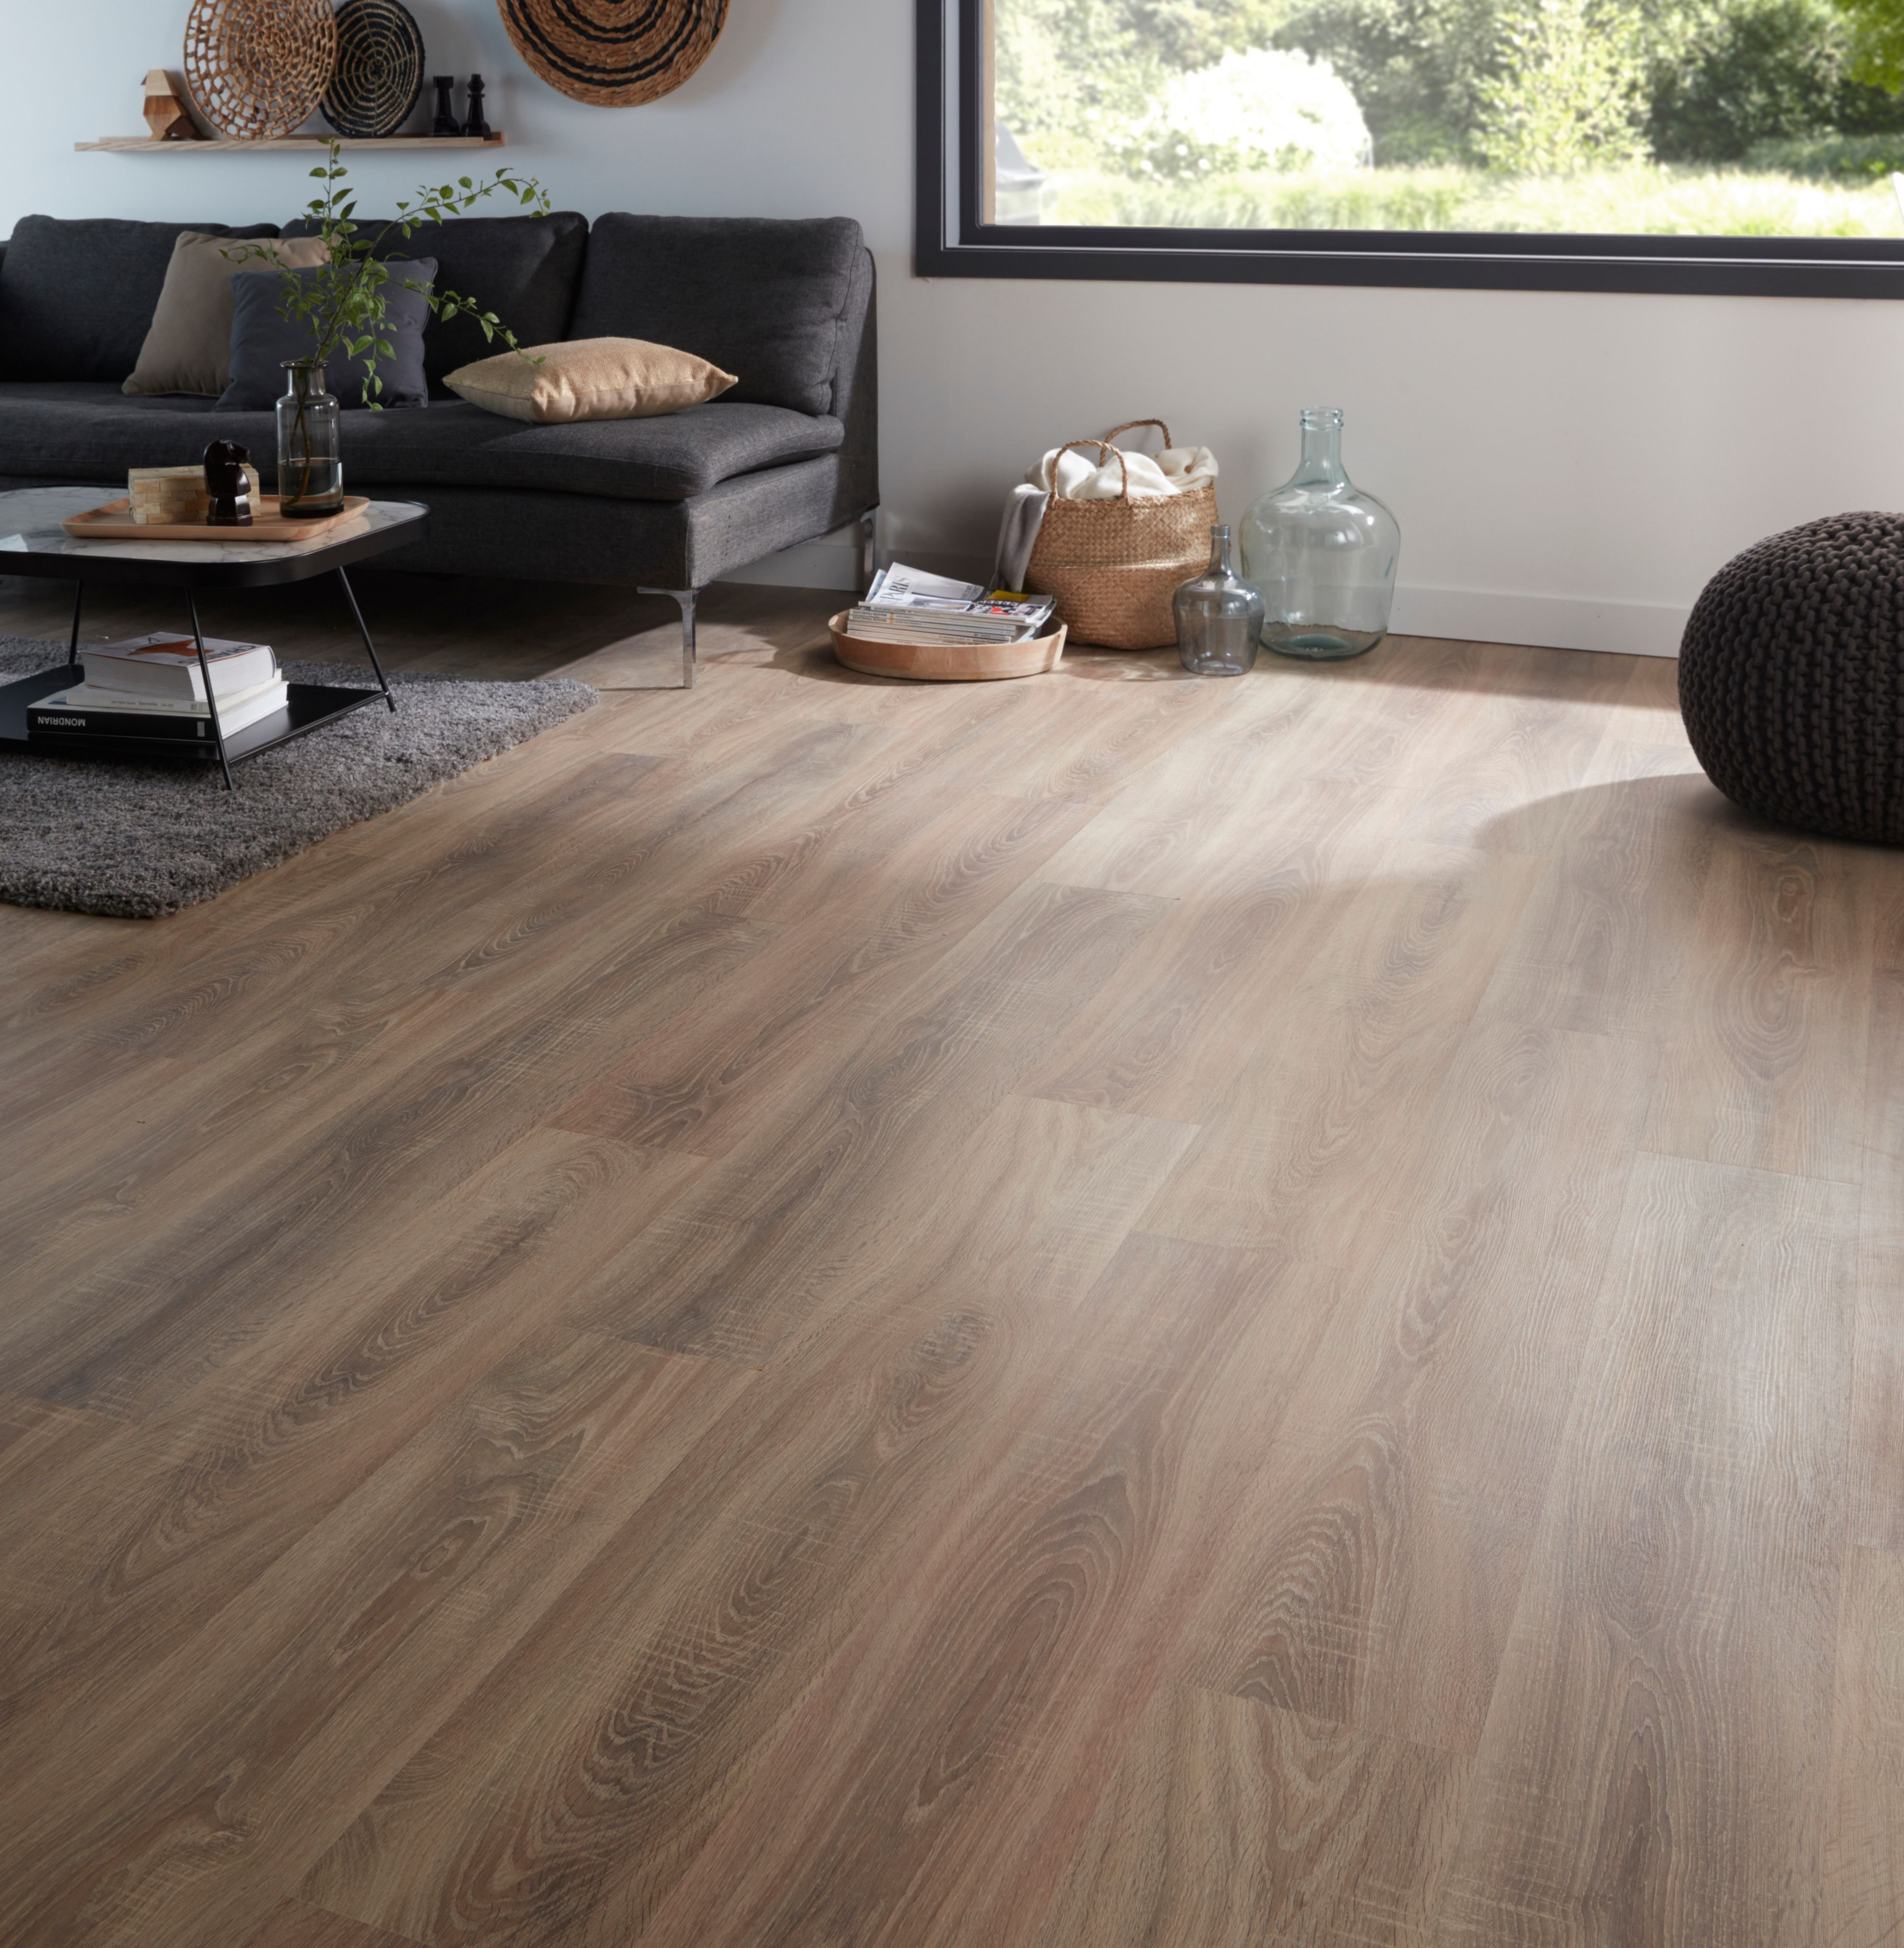 Albury natural oak effect laminate flooring sample for B q laminate flooring